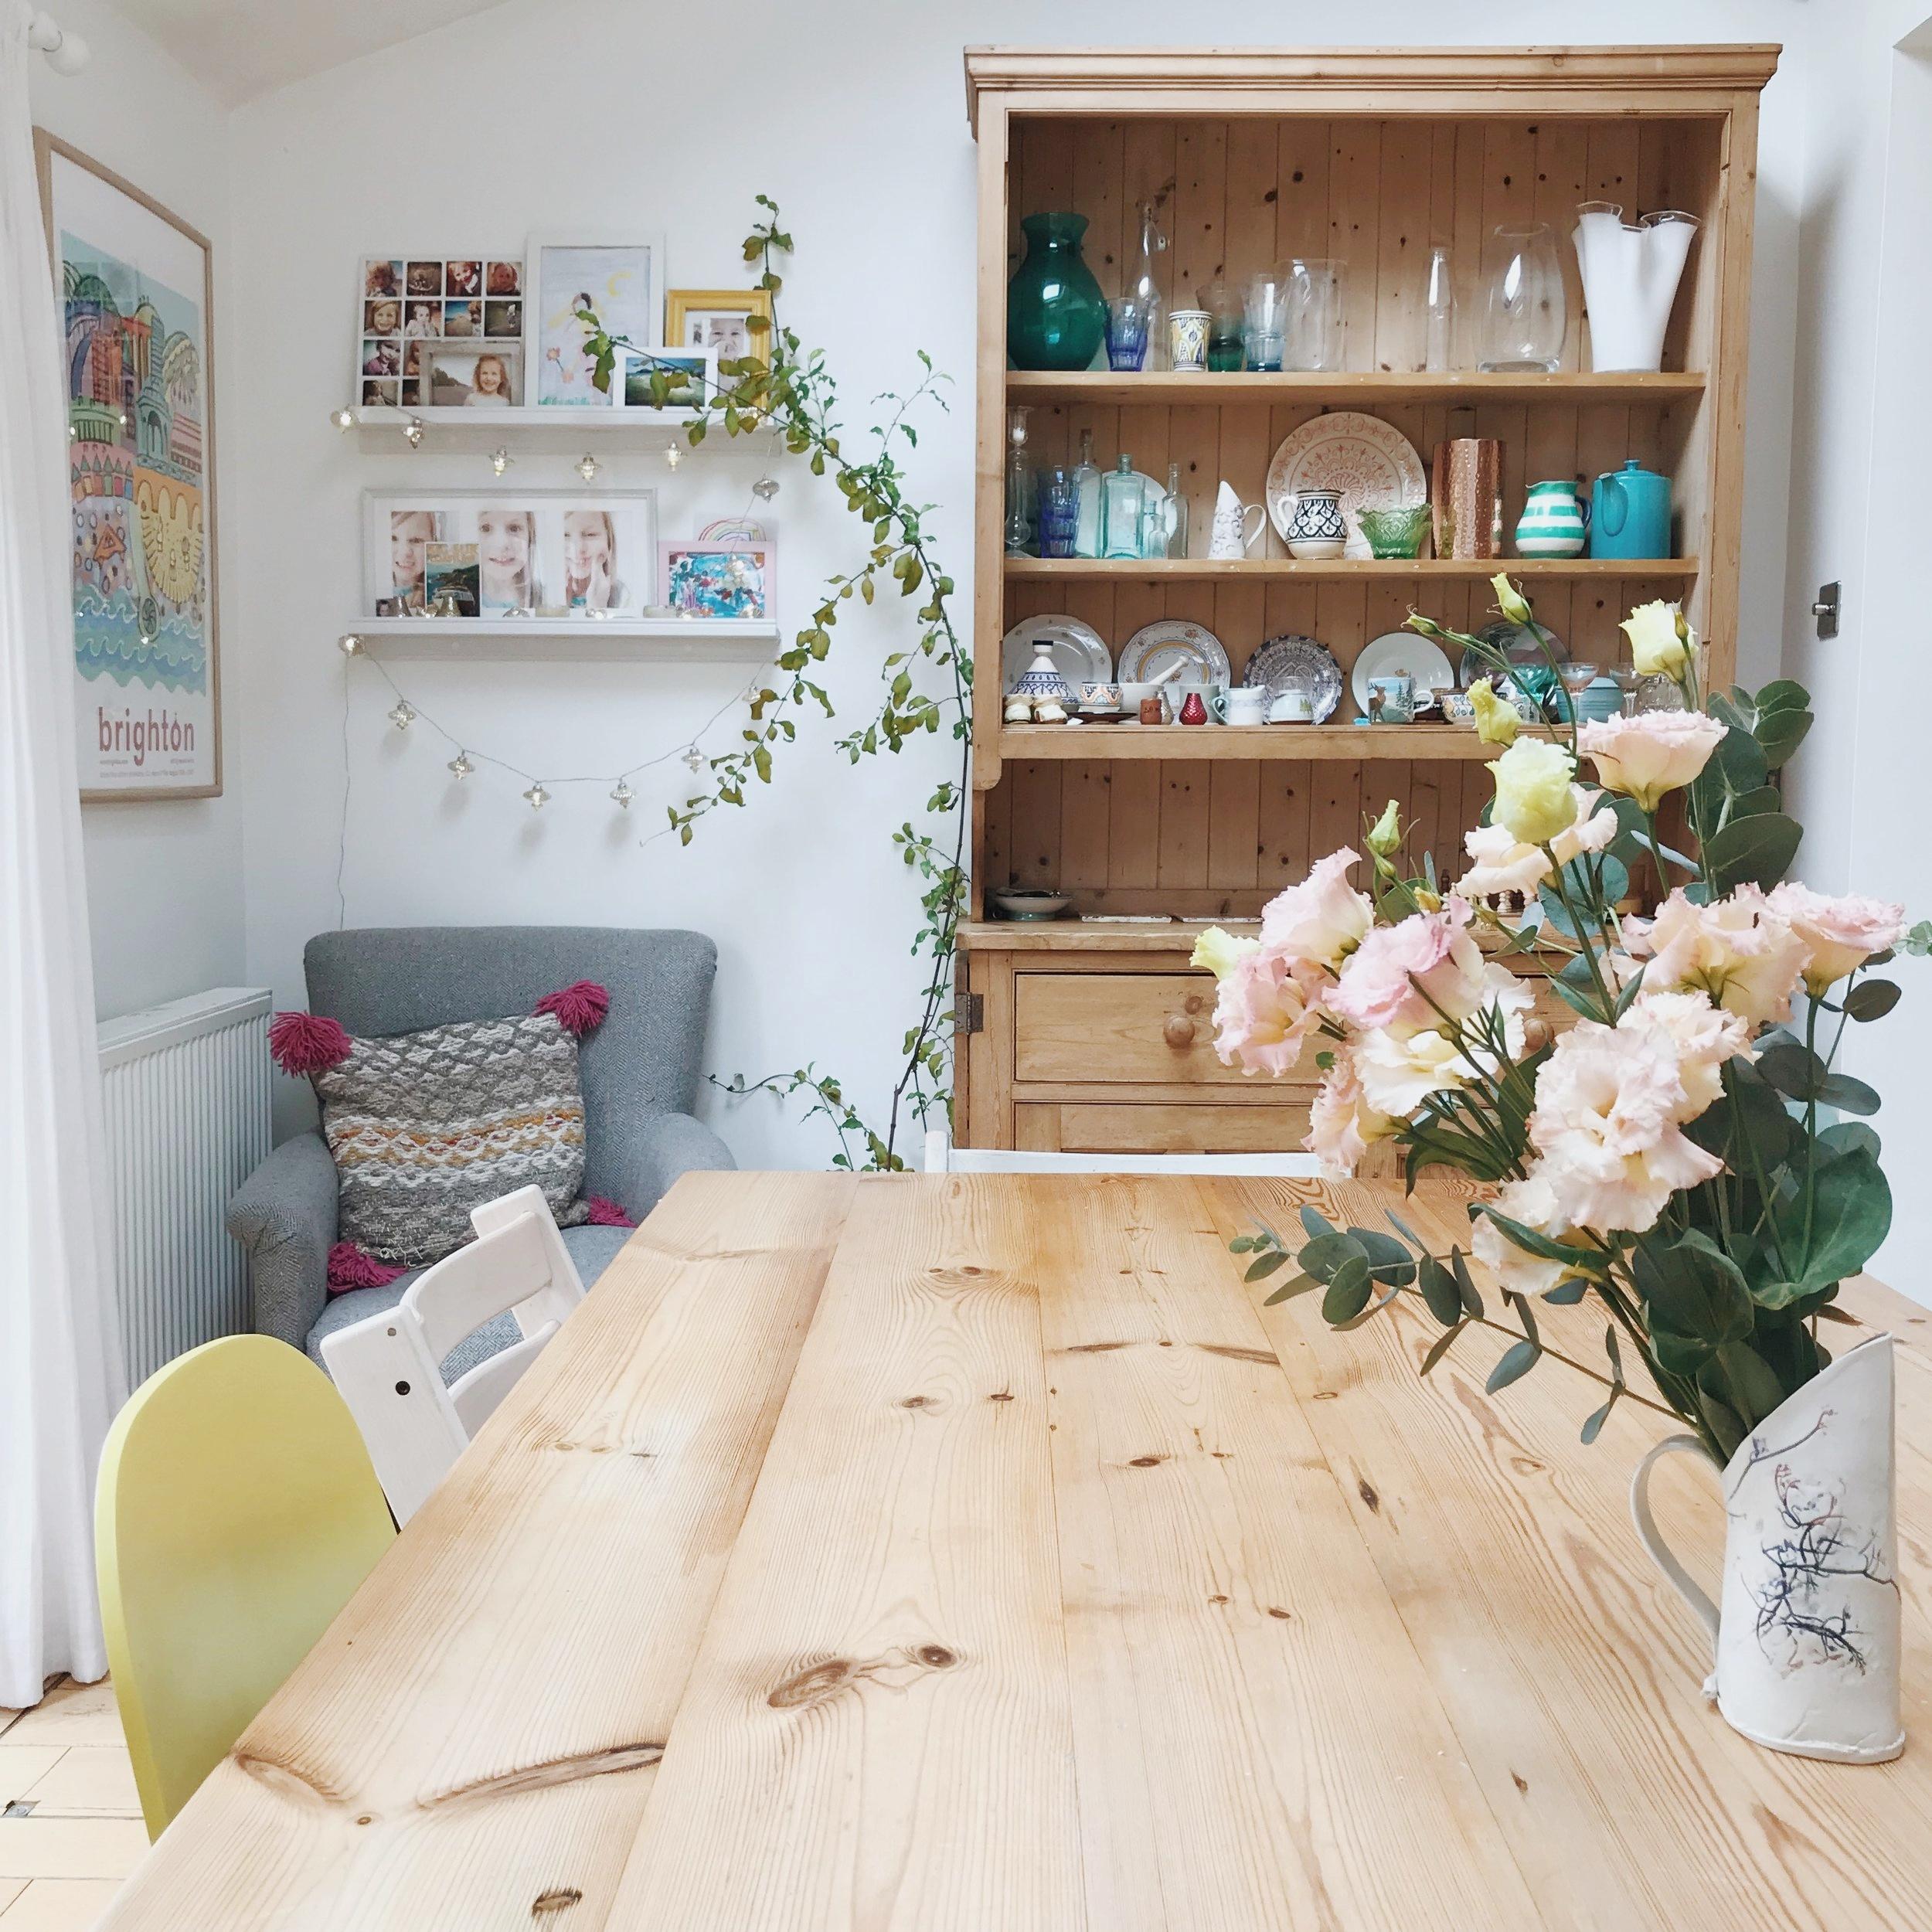 family_kitchen_table.jpg